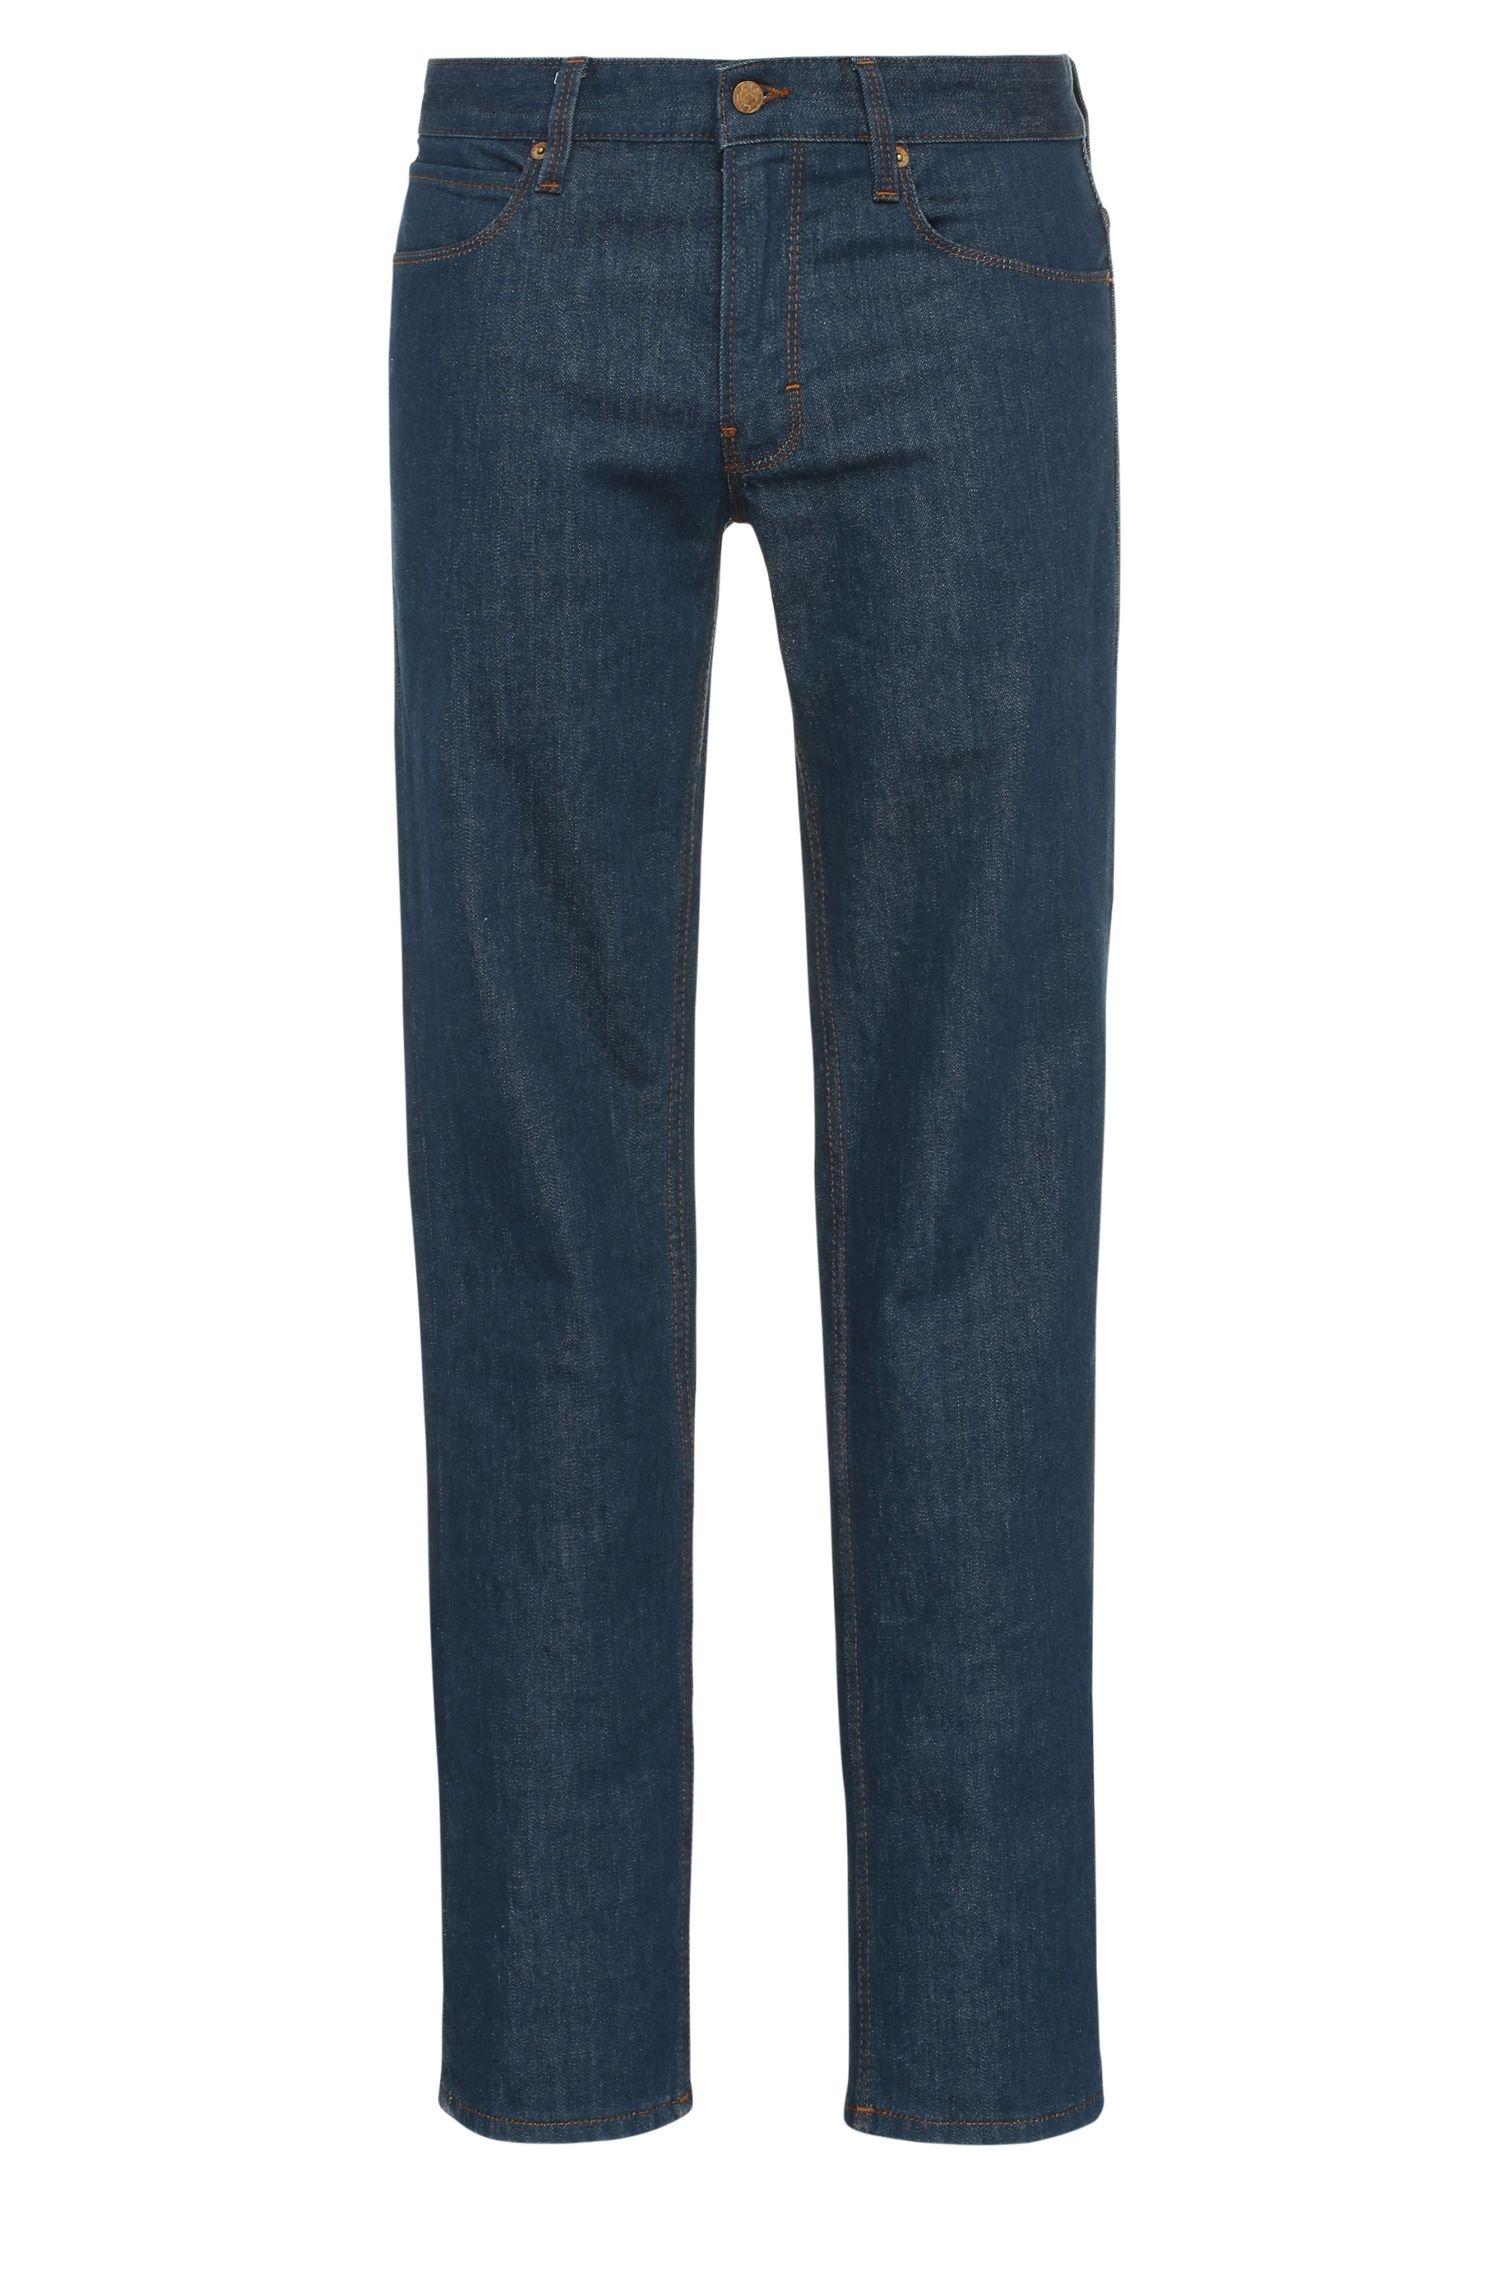 11 oz Stretch Cotton Jeans, Slim Fit | Orange63